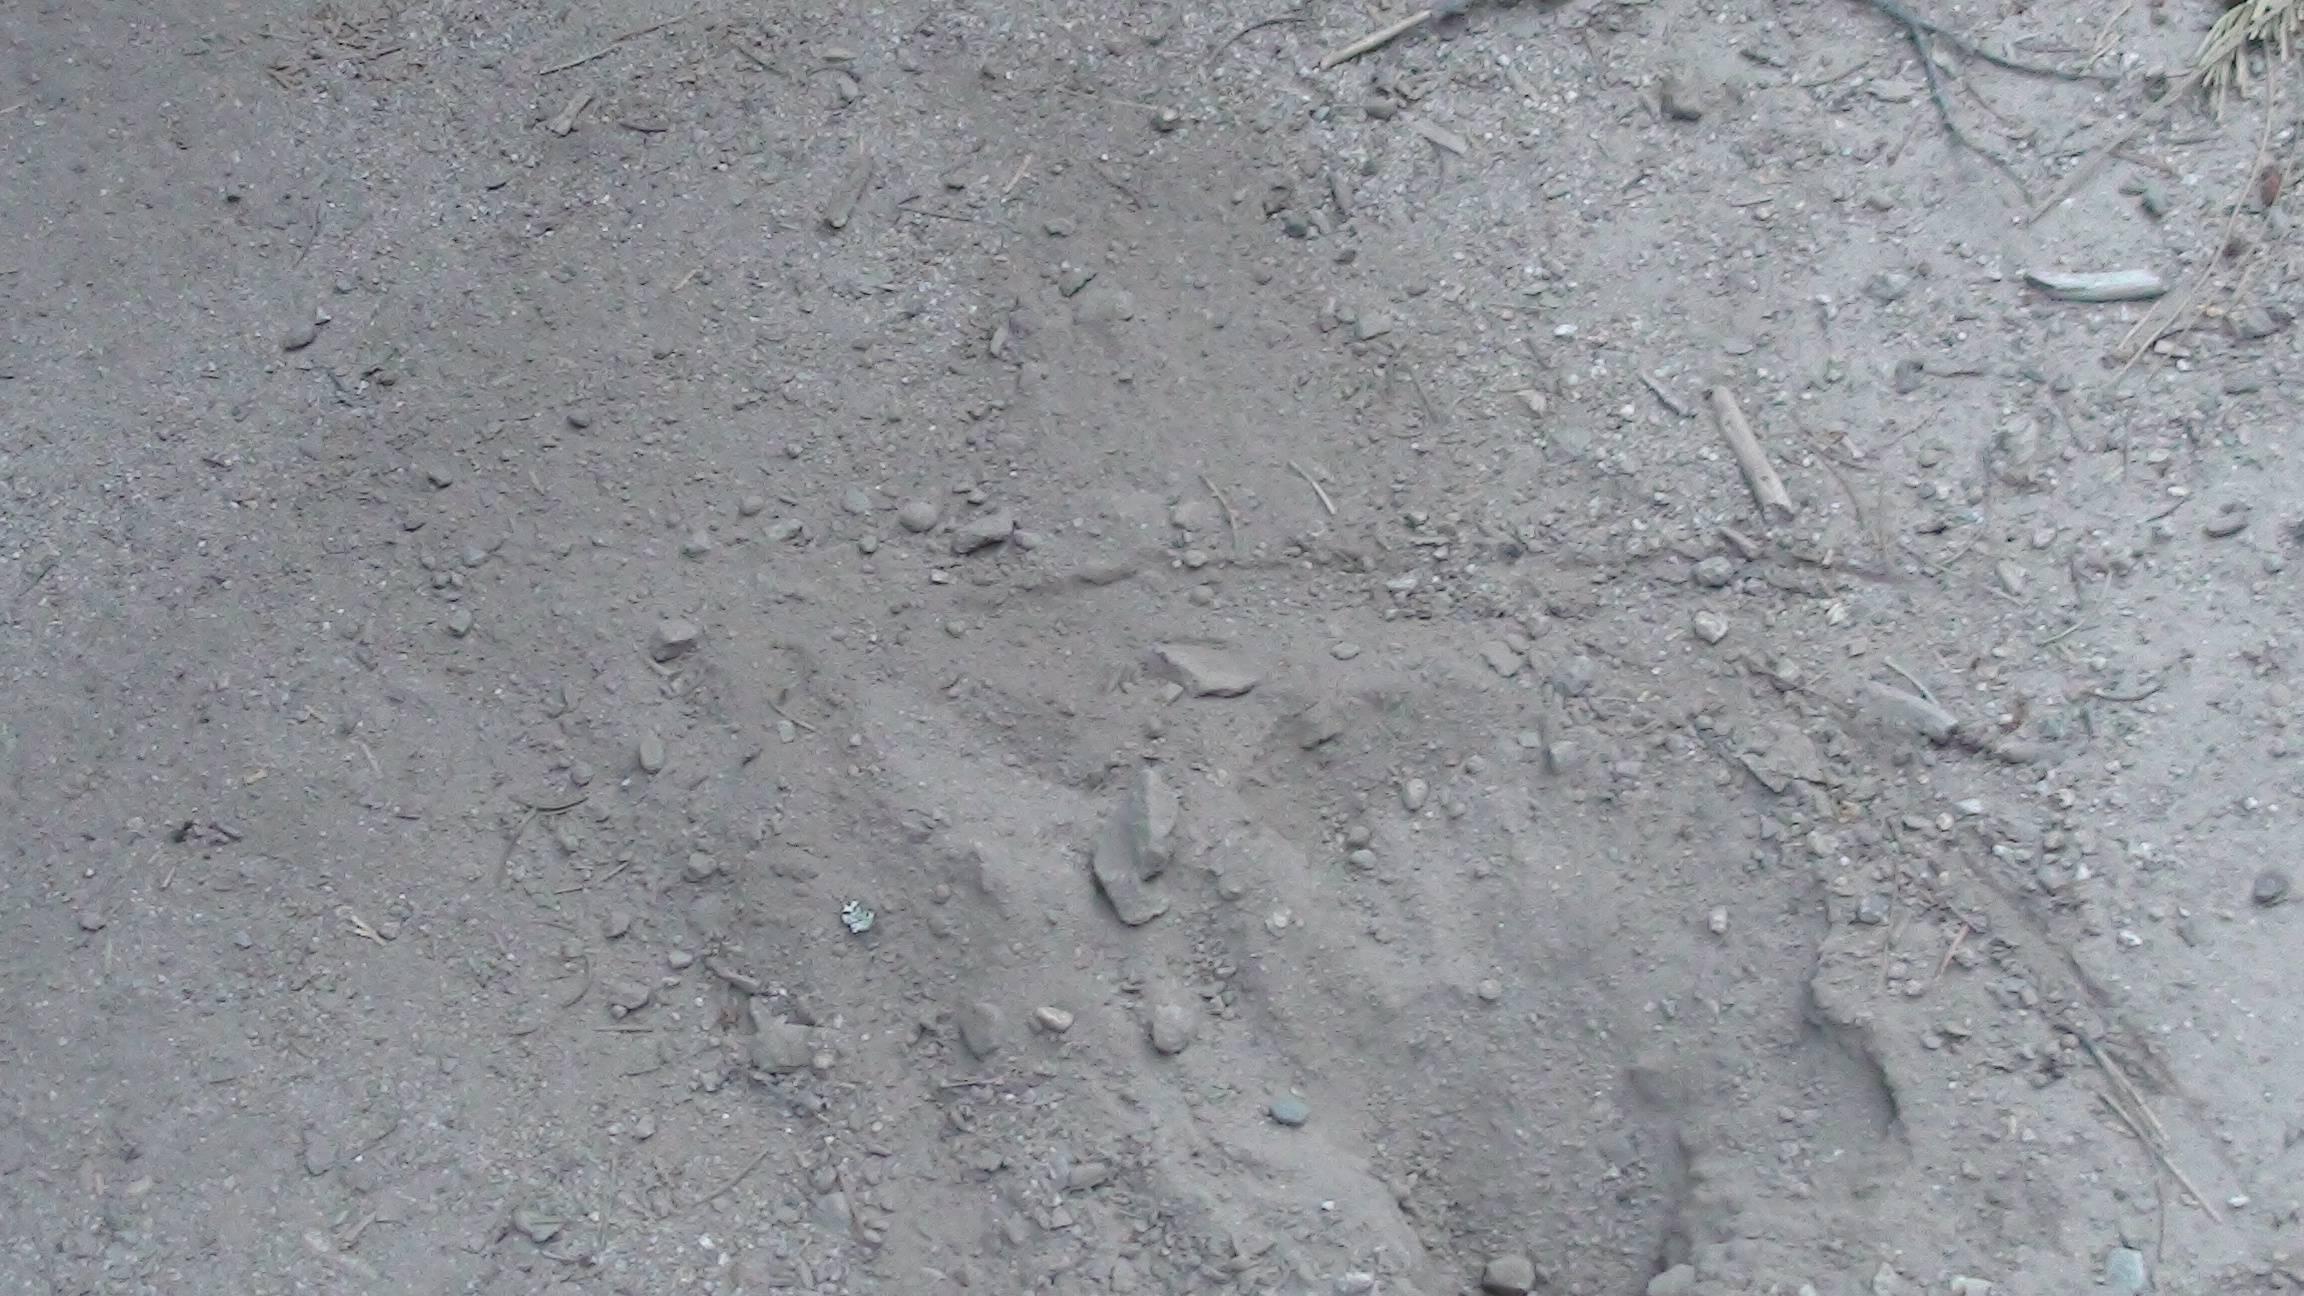 Sasquatch Investigation August 2016